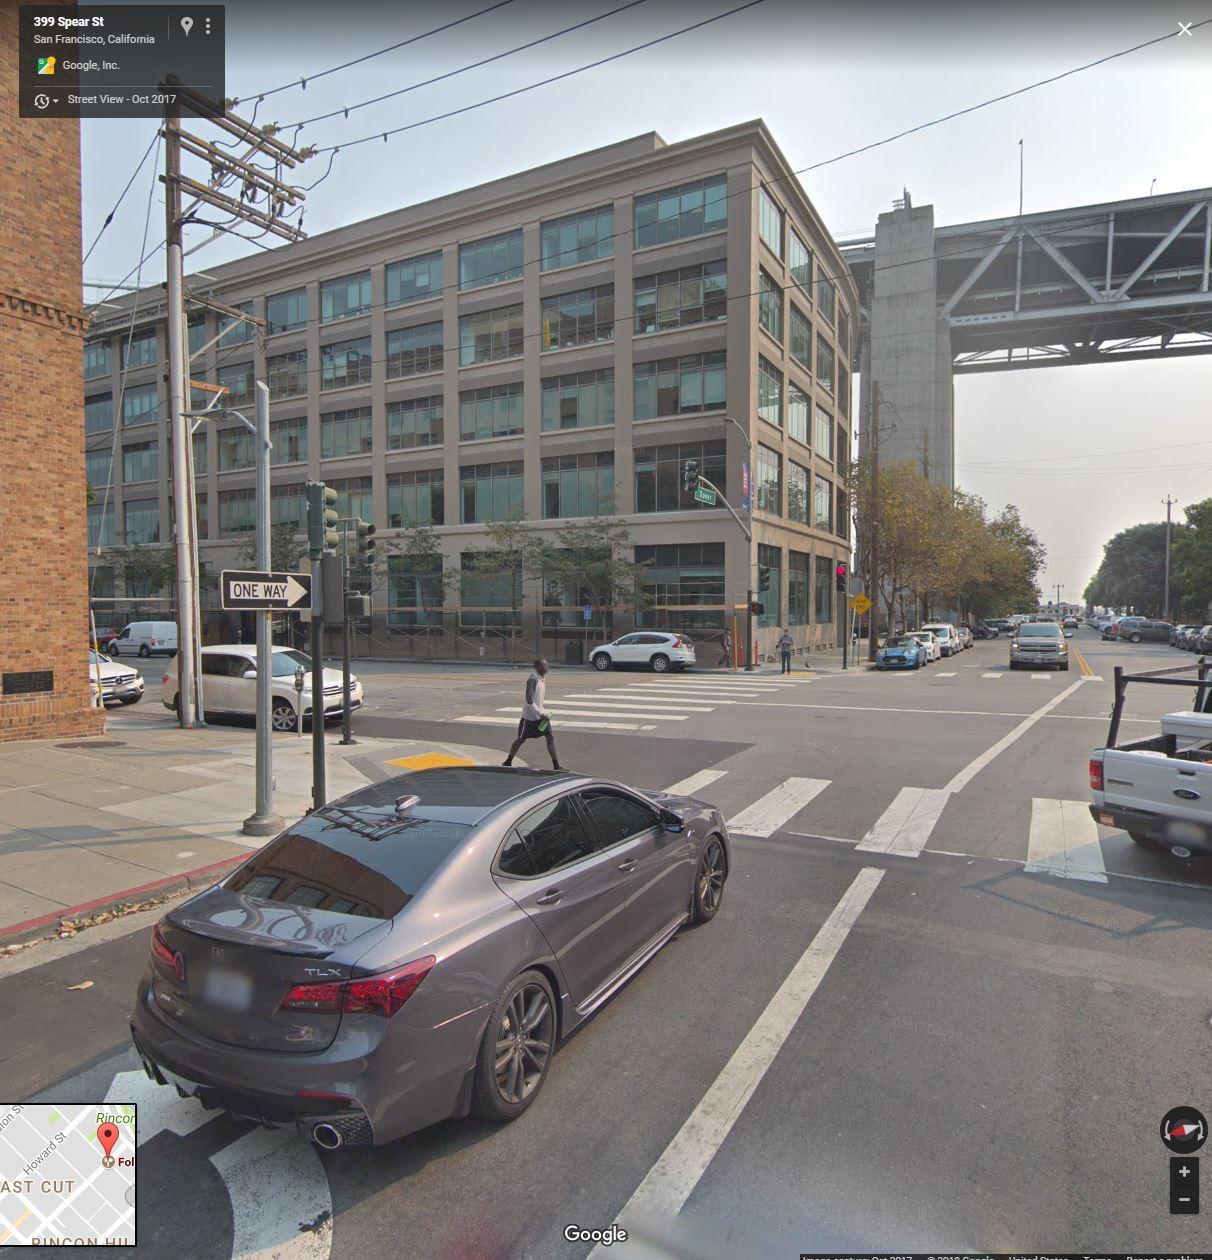 Caught An Aspec On Google Maps